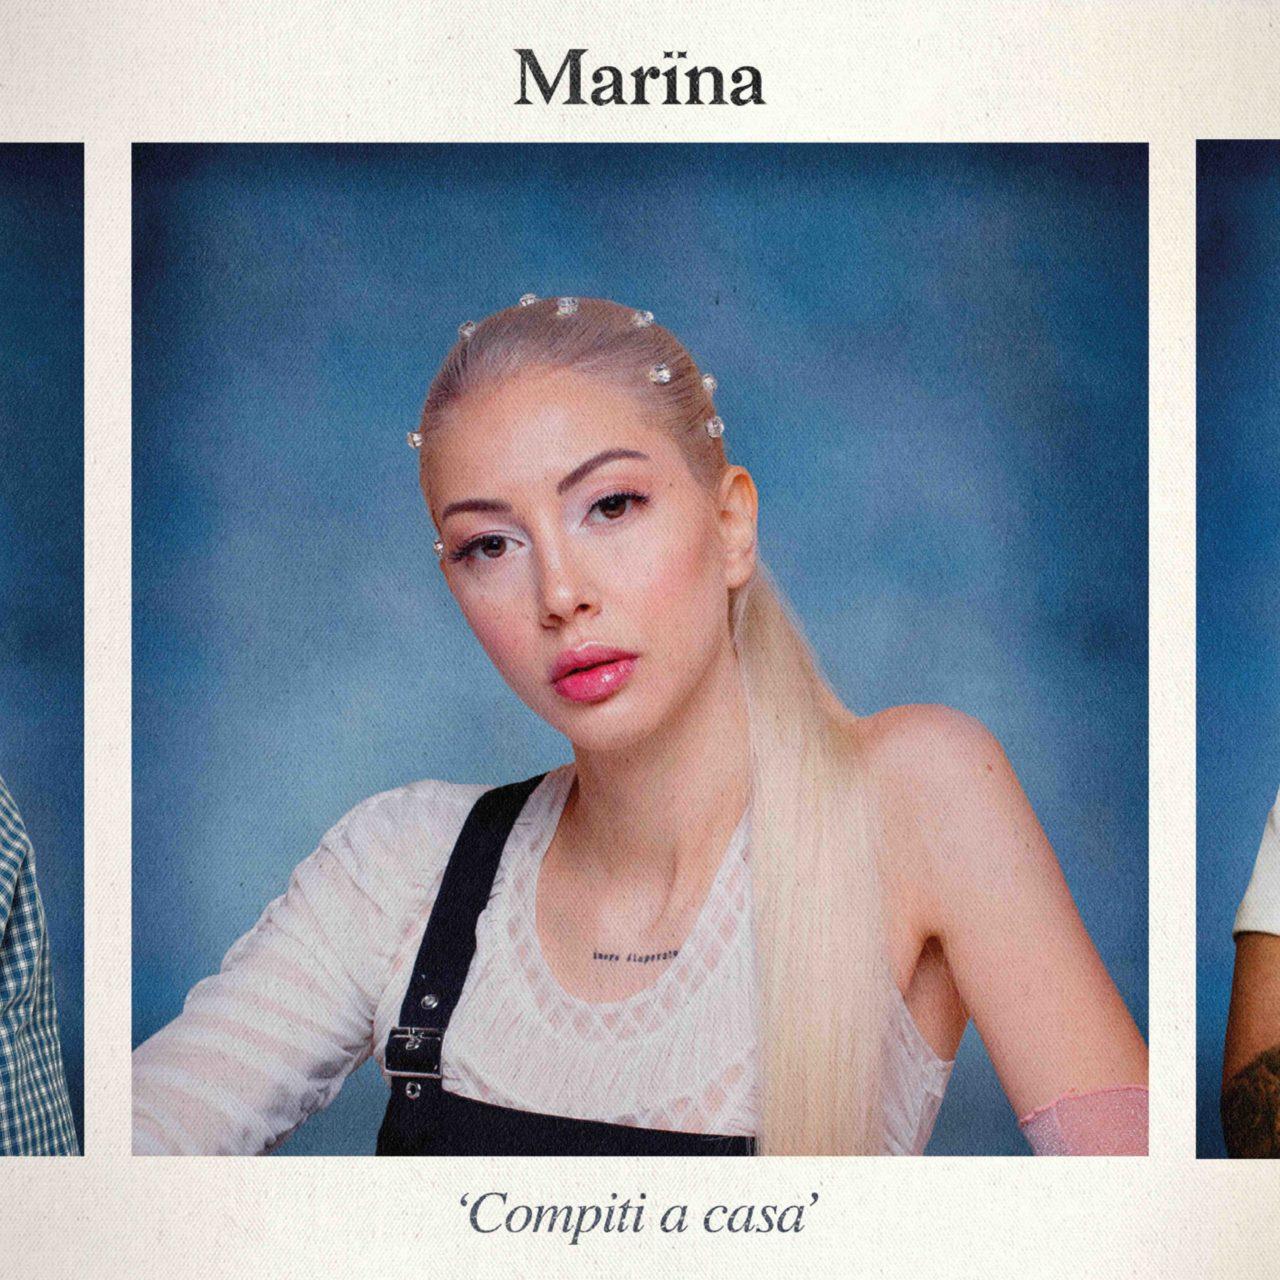 Marina - Compiti a casa (Cover Album)